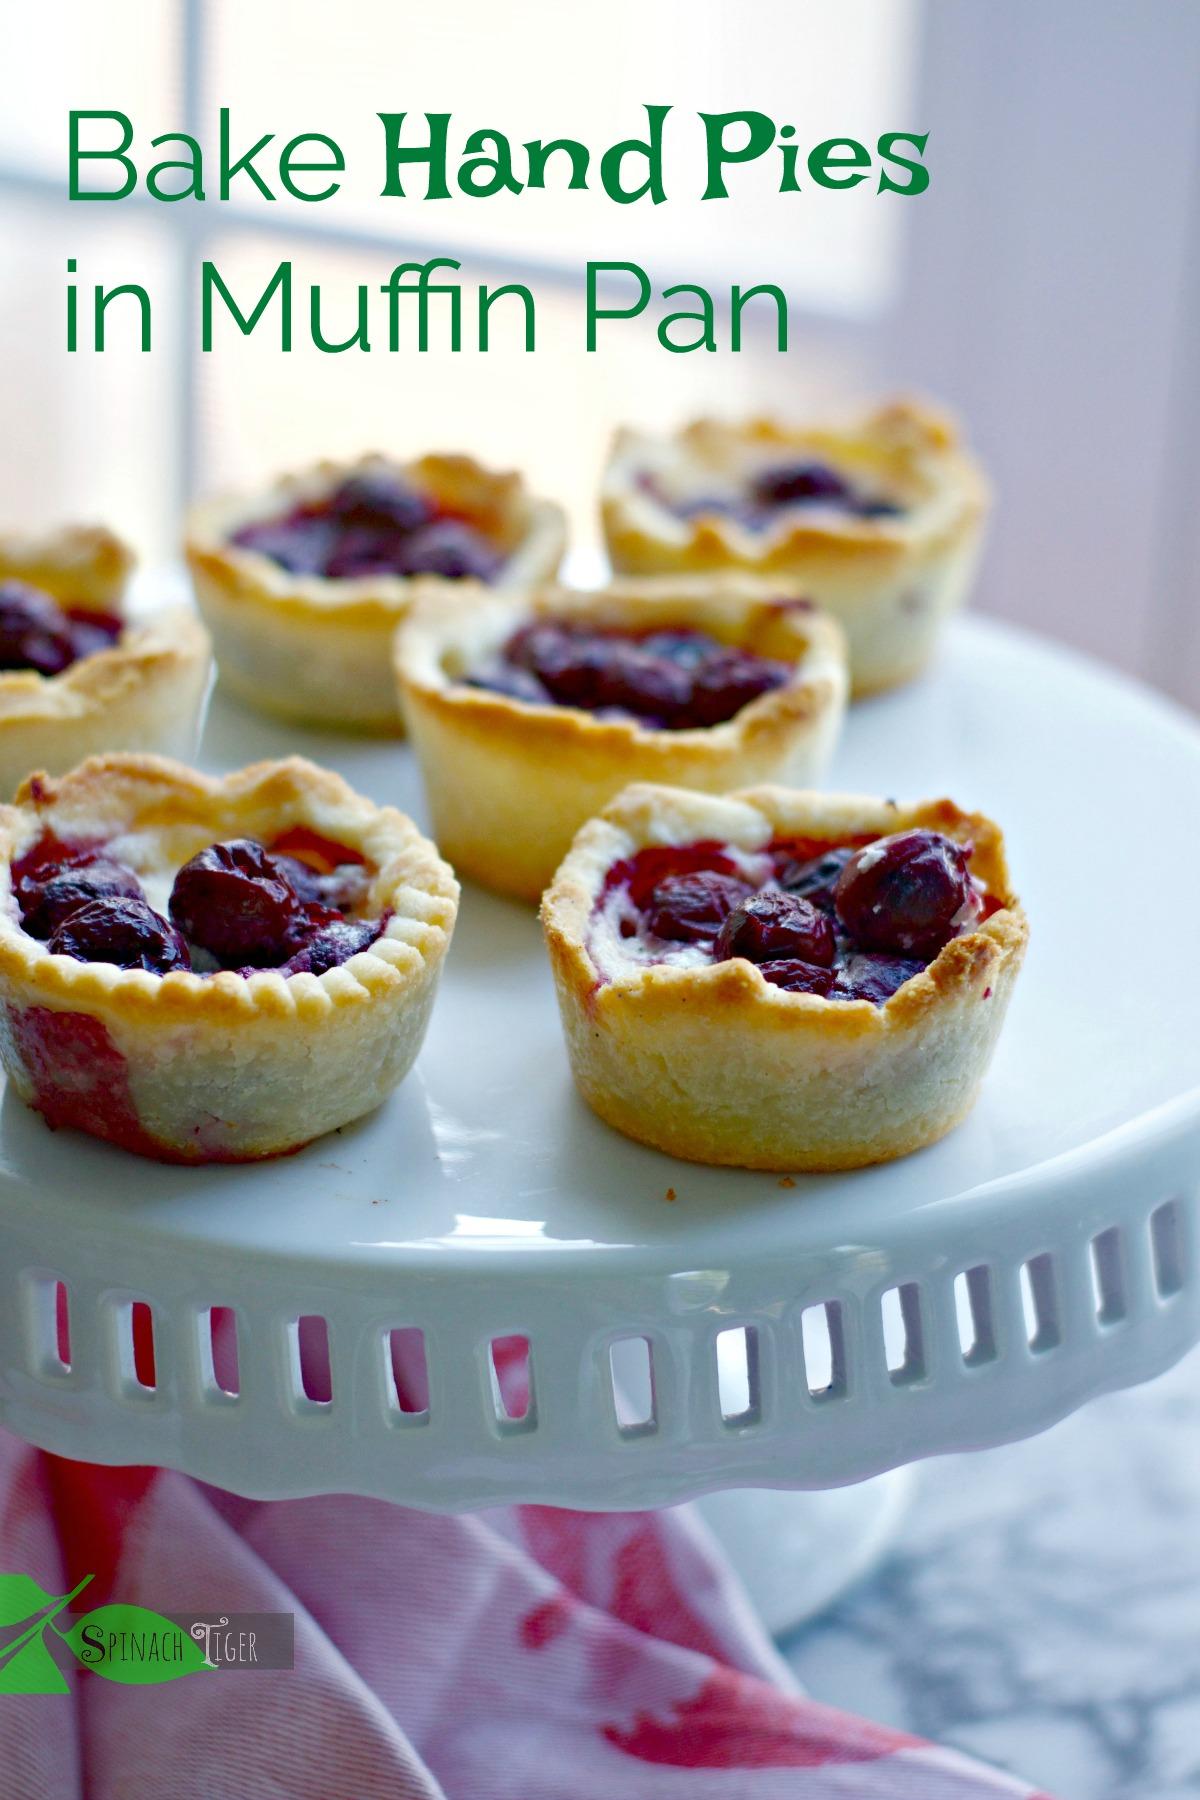 Cherry Mascarpone Mini Pie Recipes from Spinach Tiger